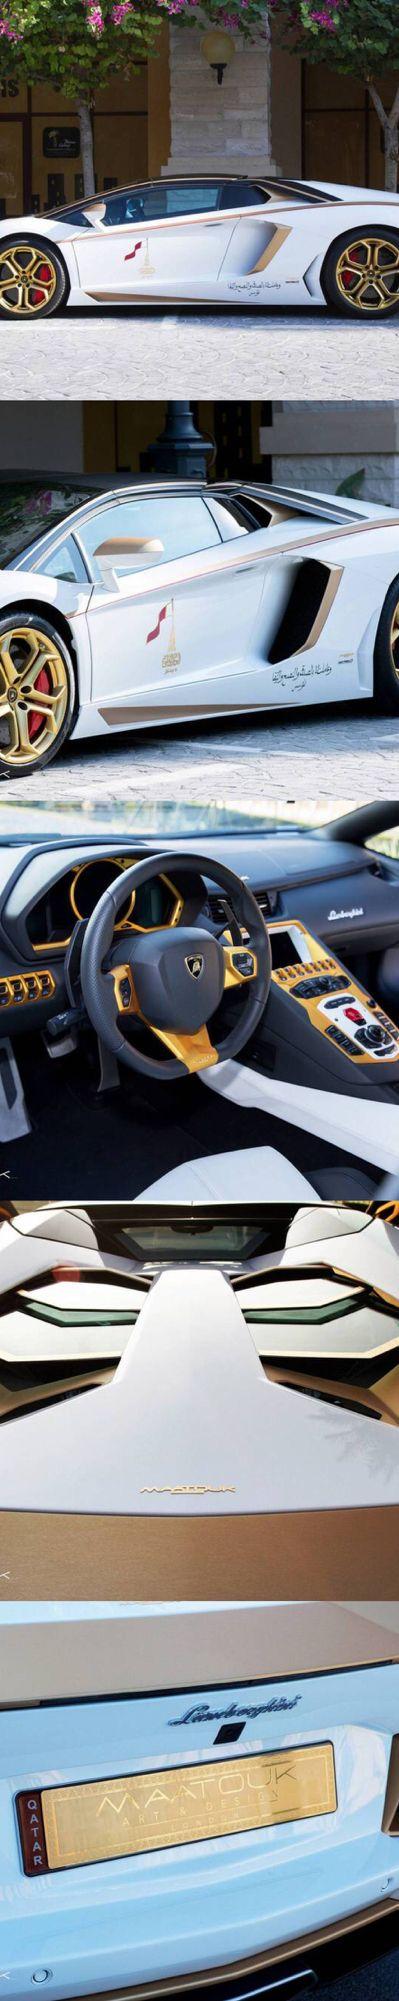 lamborghini luxury luxurydotcom autres vehicules other vehicles. Black Bedroom Furniture Sets. Home Design Ideas